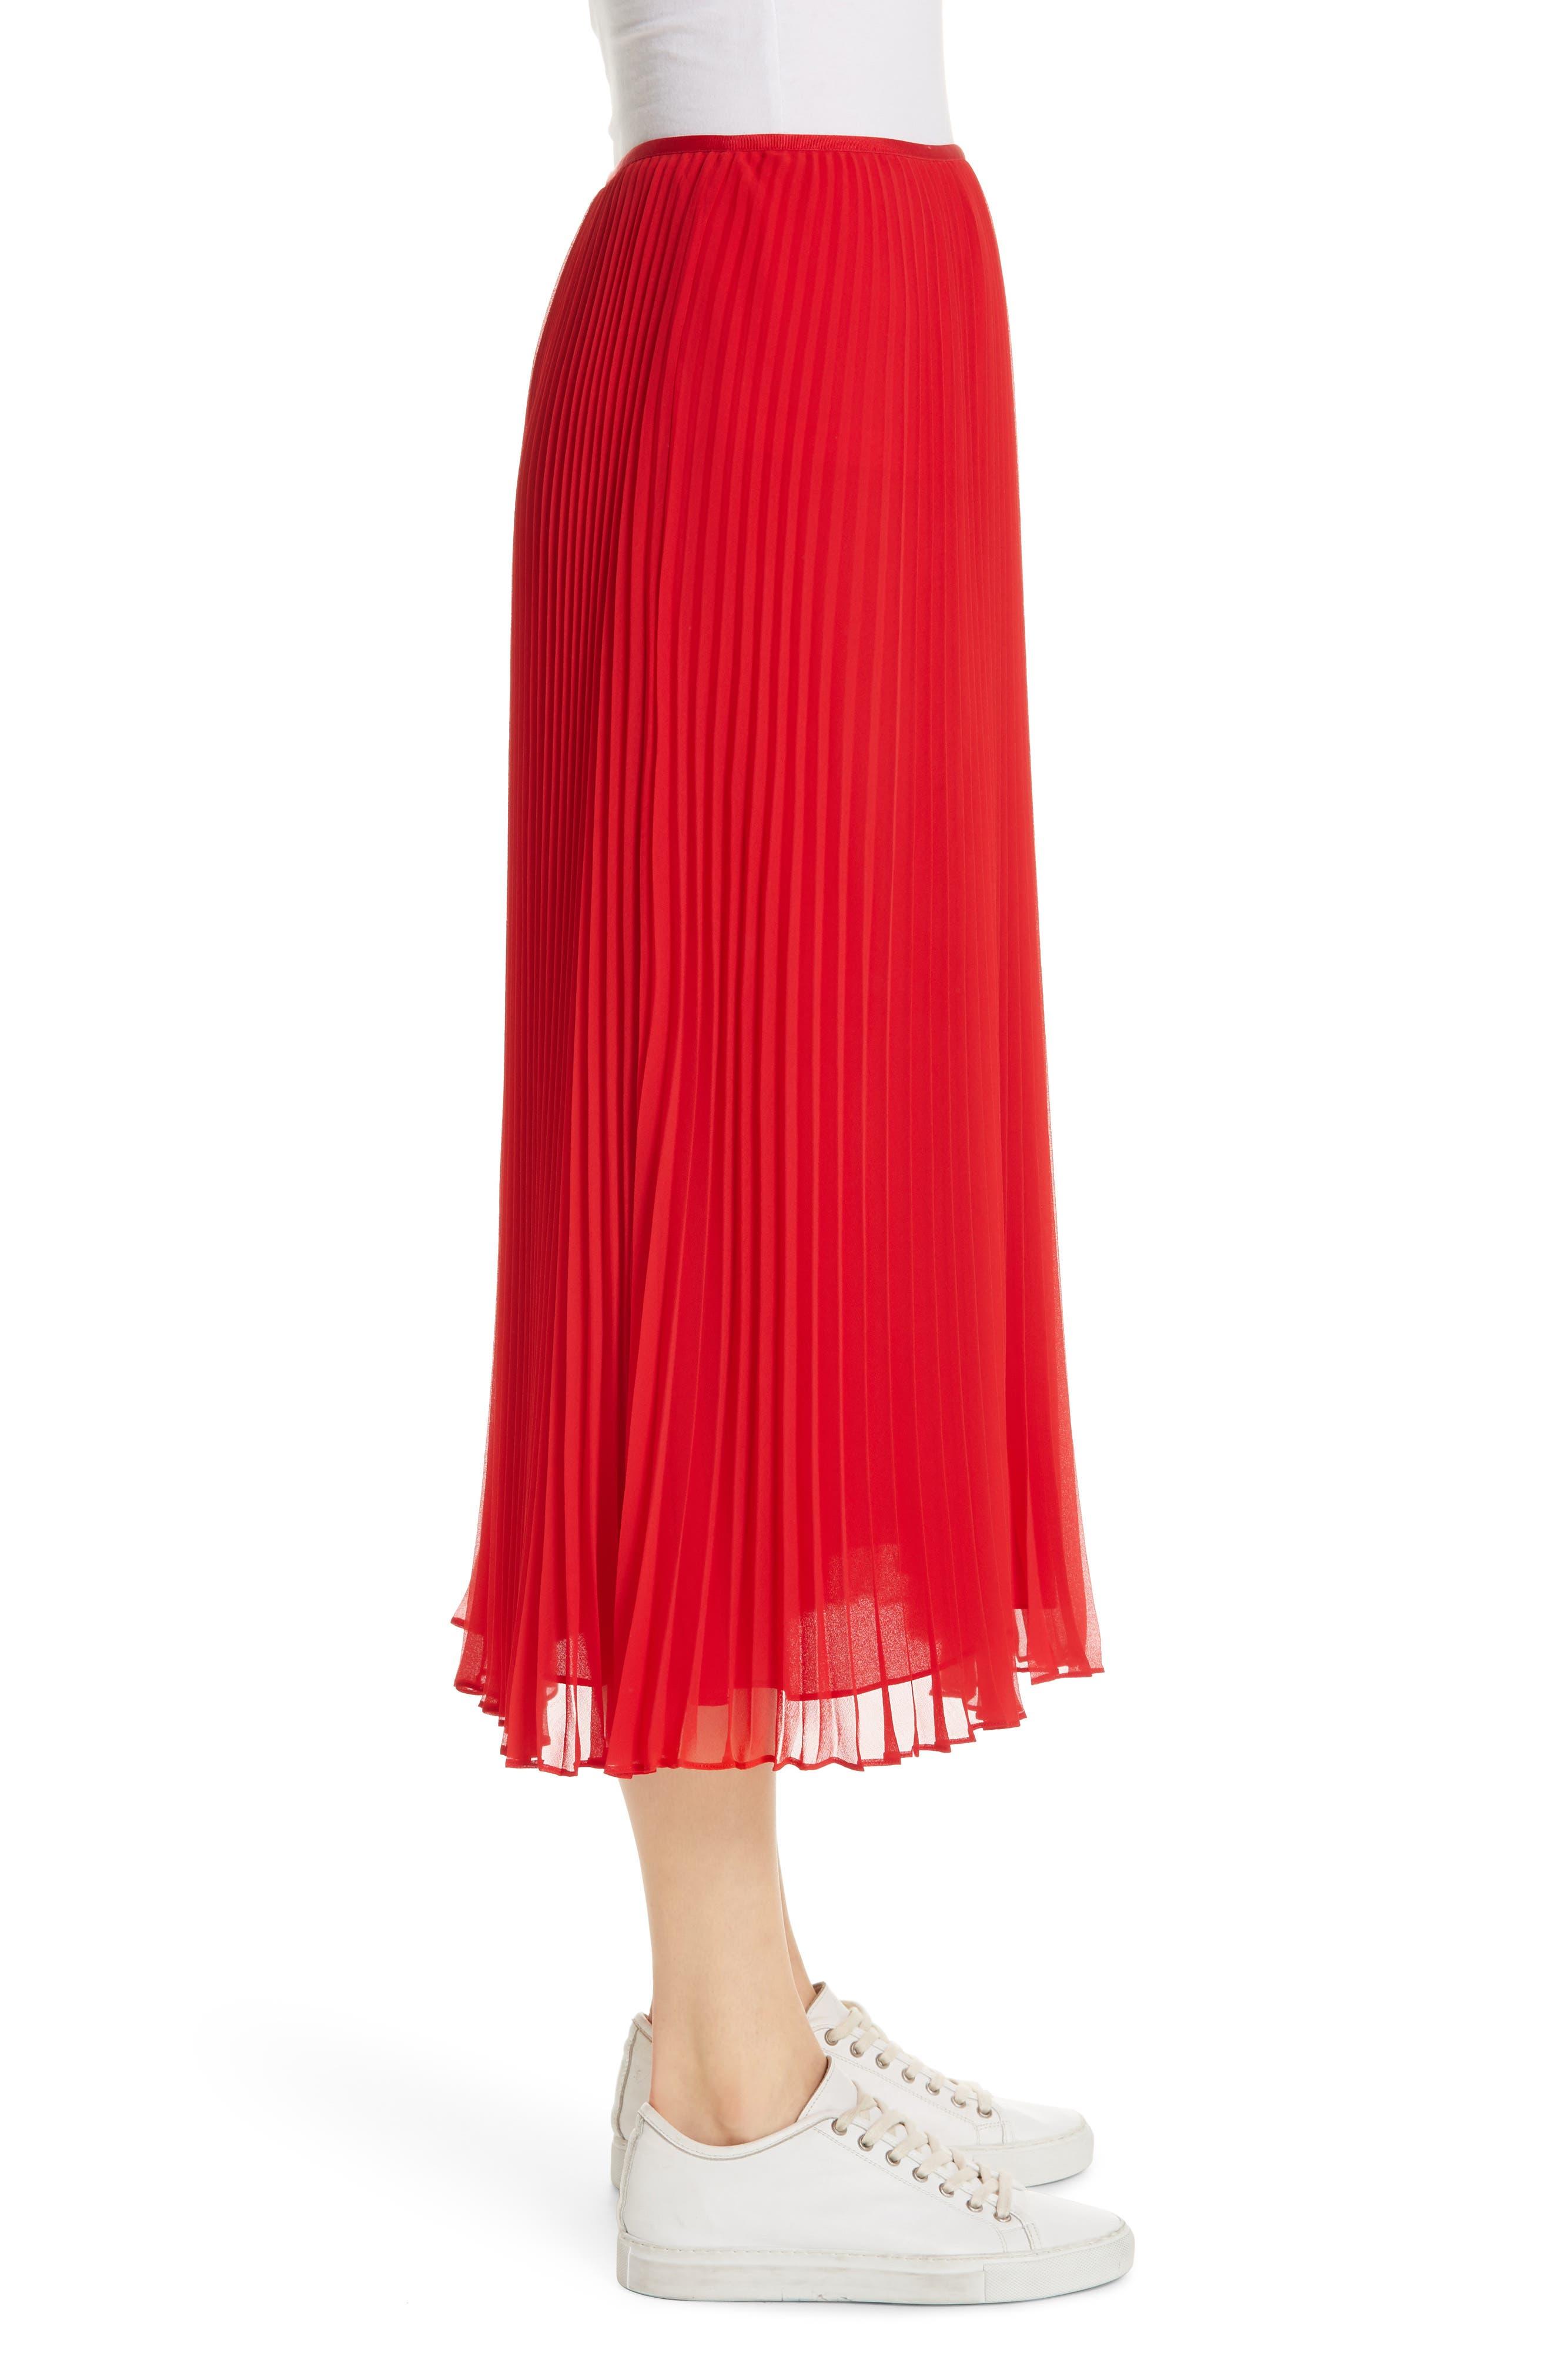 POLO RALPH LAUREN, Pleat Midi Skirt, Alternate thumbnail 3, color, PANDORA RED